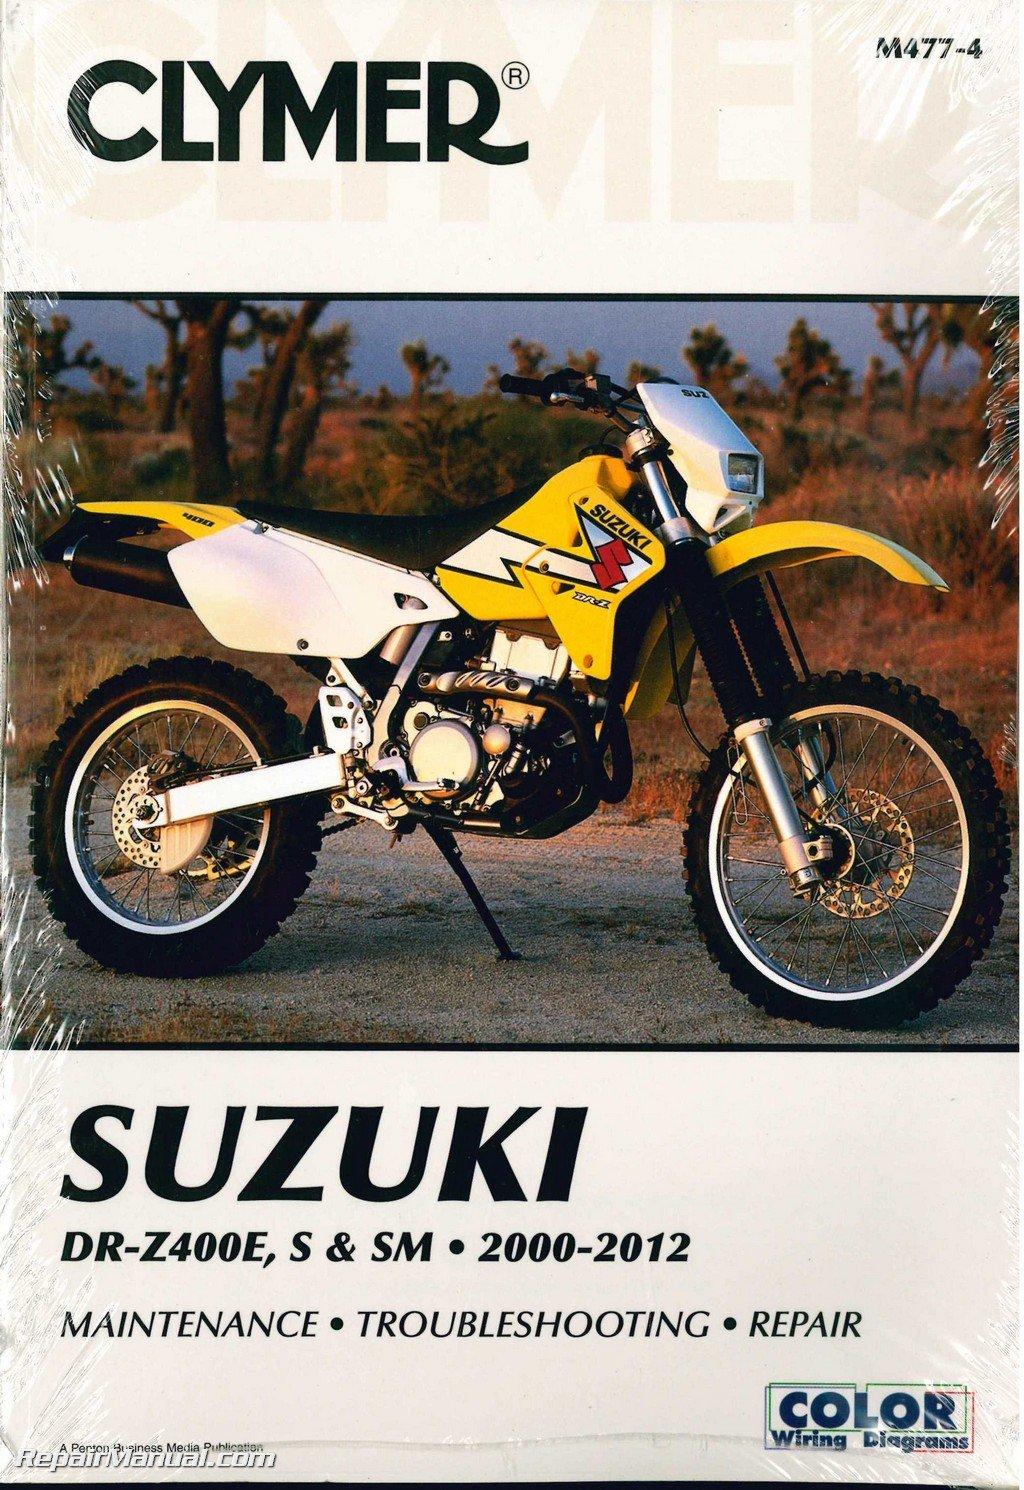 M477-4 DR-Z400 DRZ400 Suzuki 2000-2012 Clymer Motorcycle Repair Manual:  Manufacturer: Amazon.com: Books